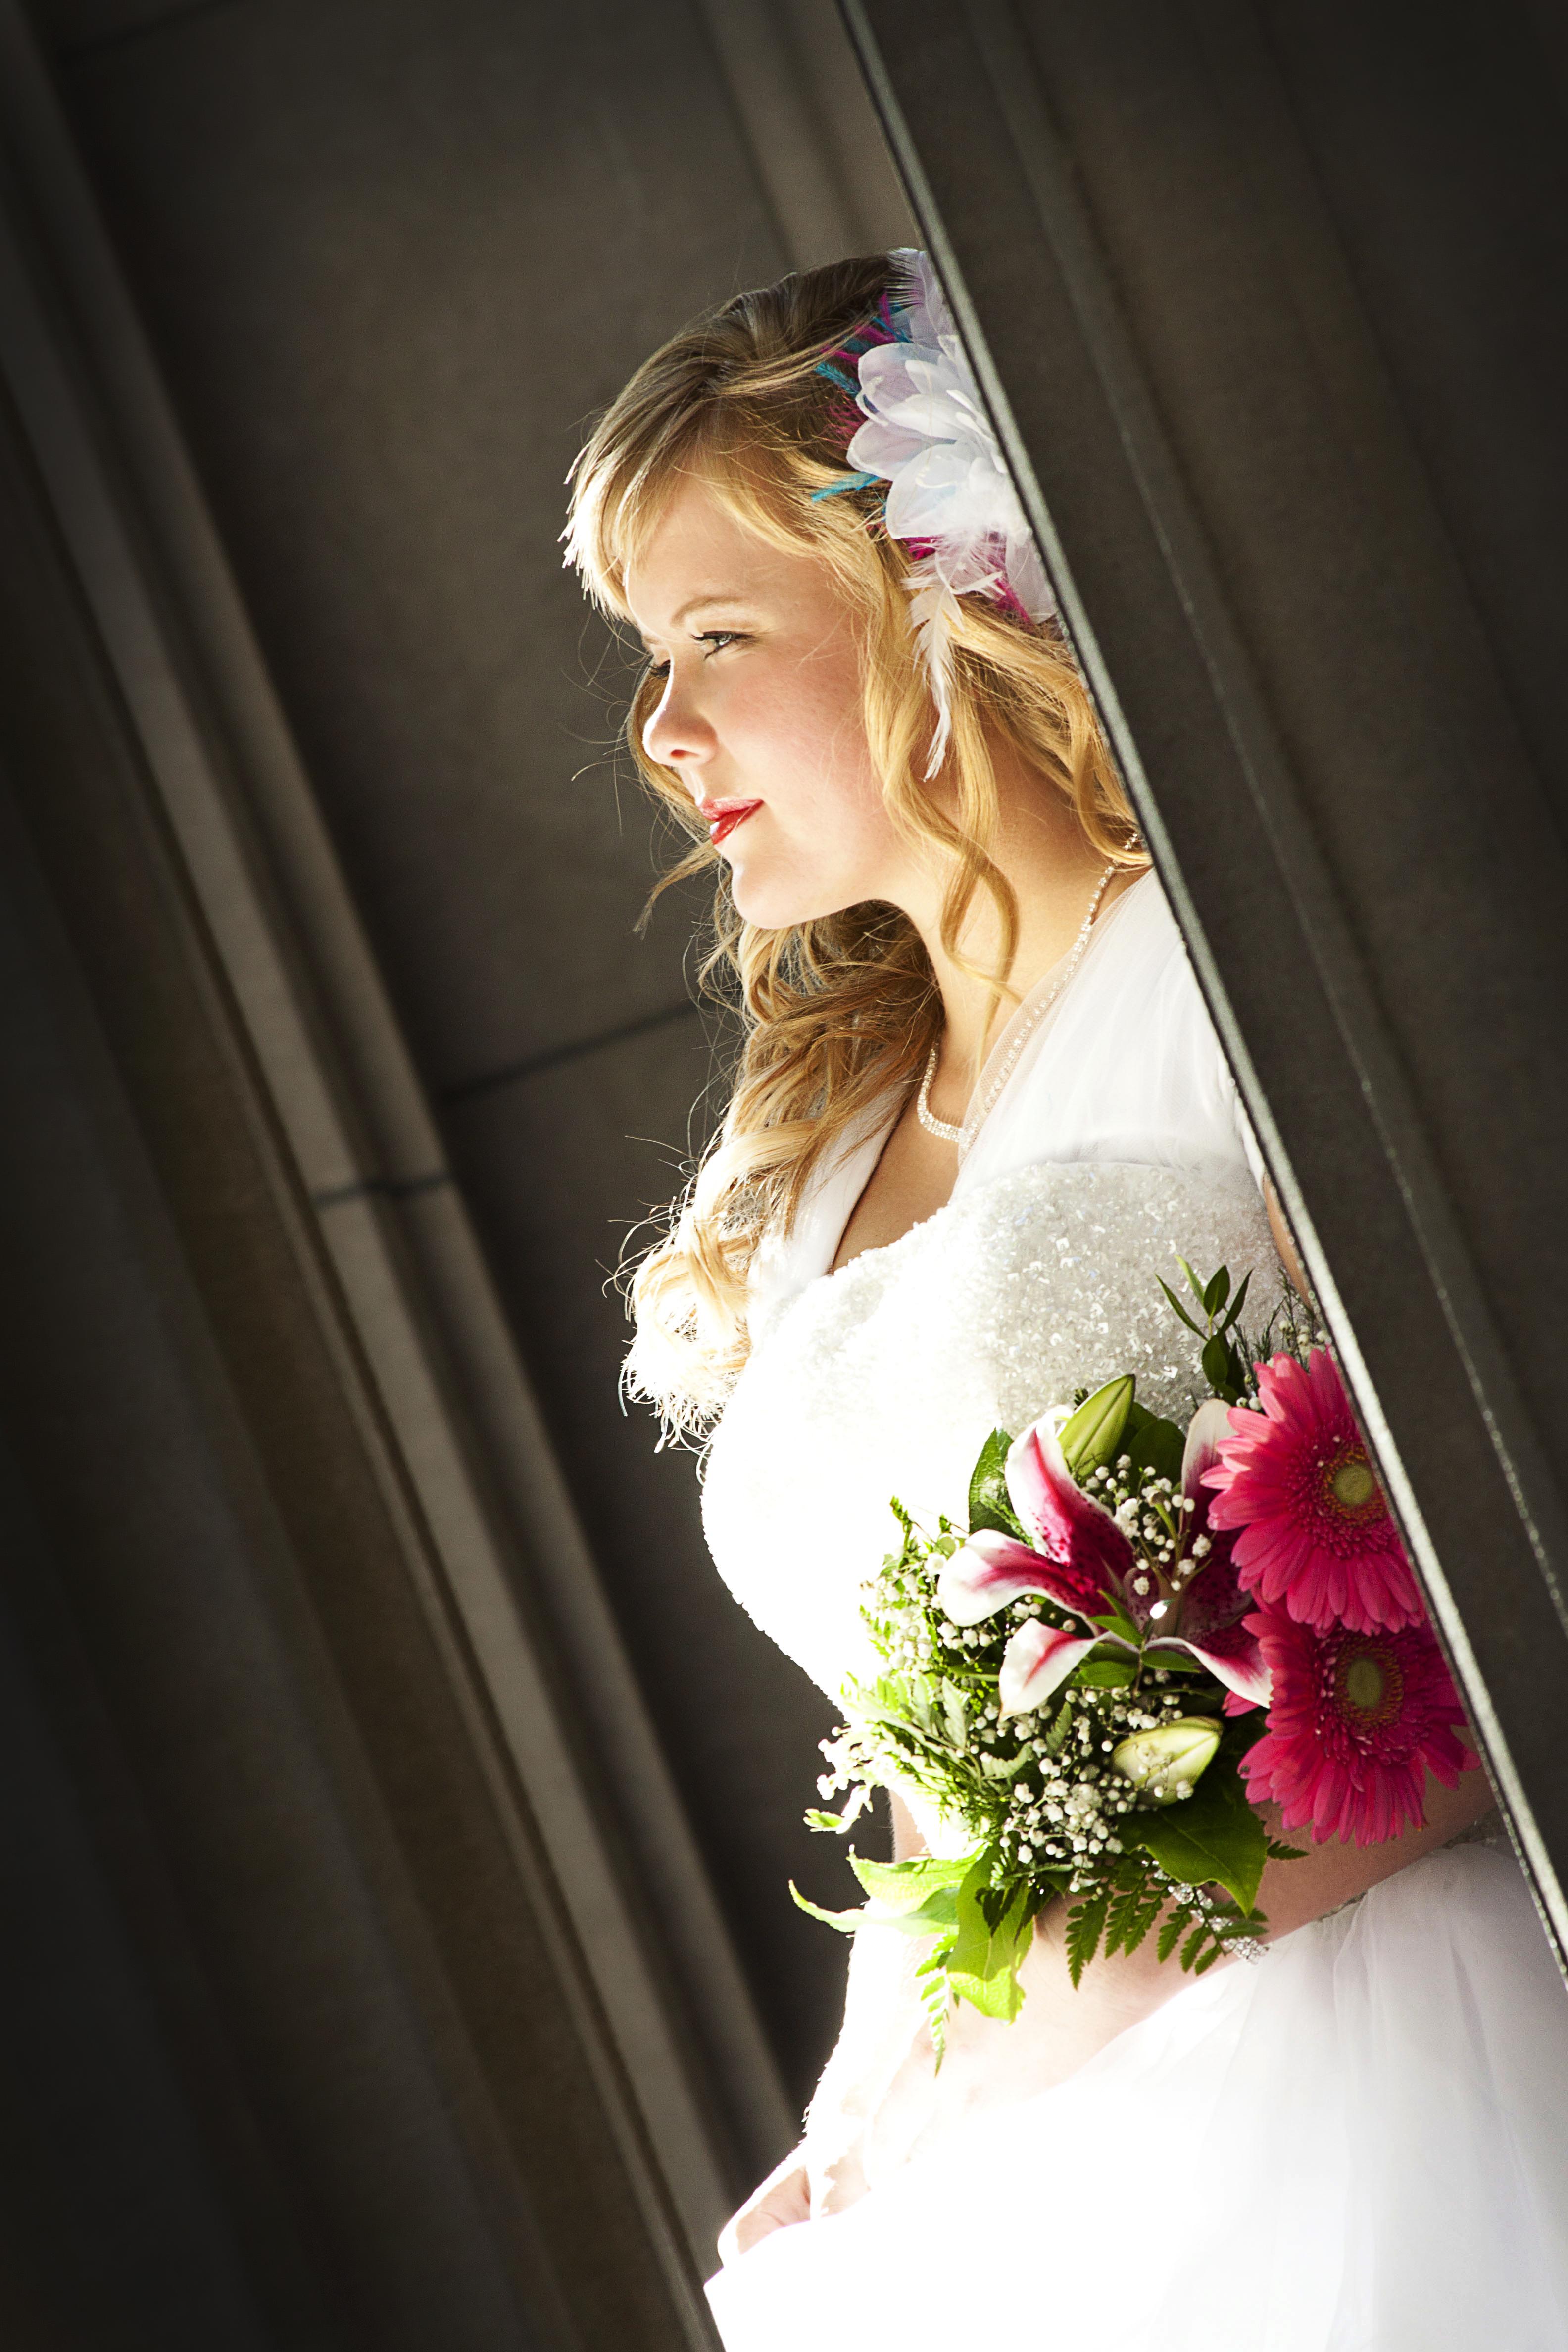 Urban bridal photography slc jessie utah wedding photographers engagements provo bridals cheap bridals utah county salt lake valley bridal photographer izmirmasajfo